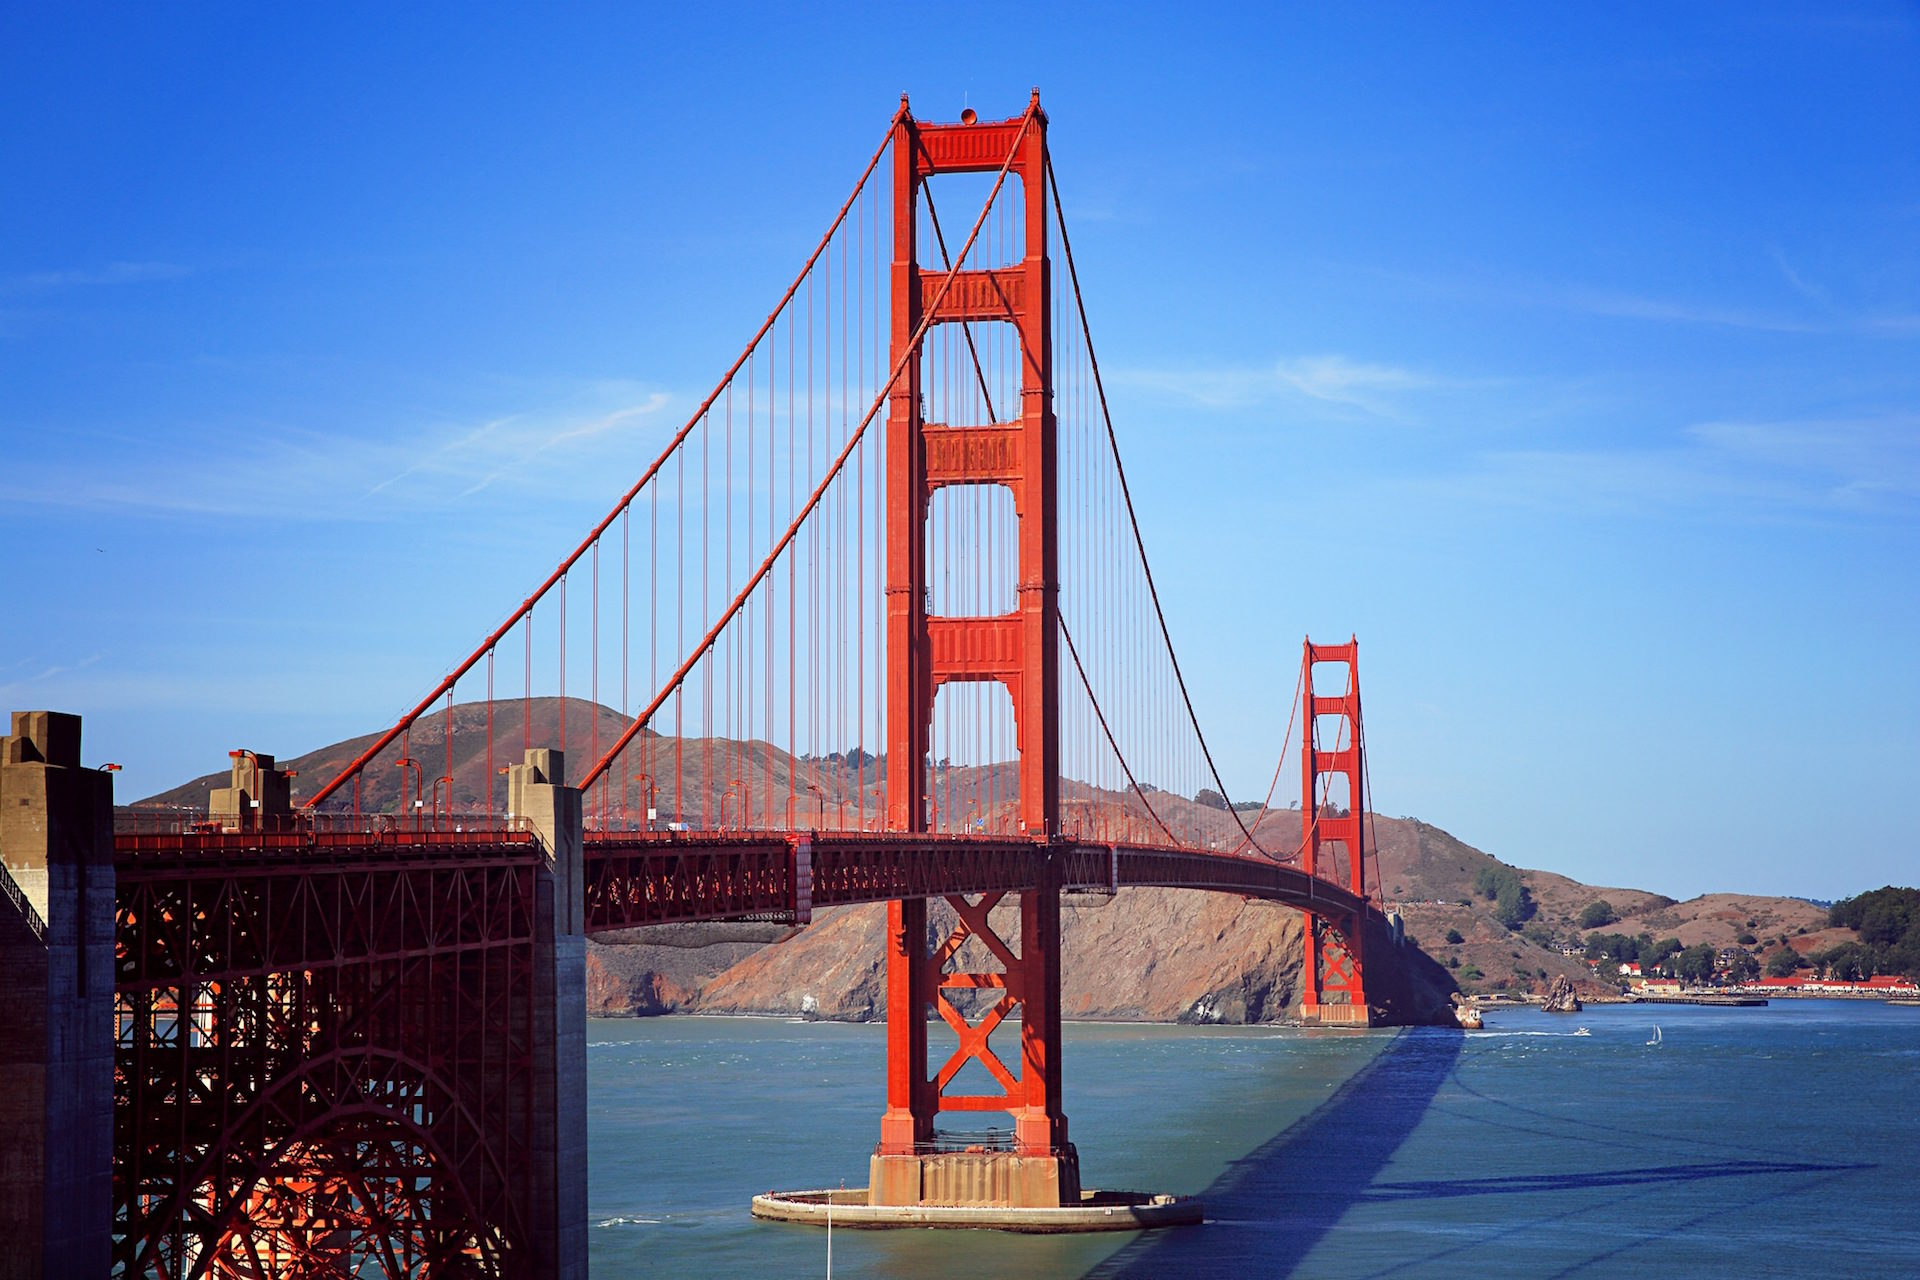 पुल, san francisco, आकाश, Montañas, संयुक्त राज्य अमेरिका - HD वॉलपेपर - प्रोफेसर-falken.com